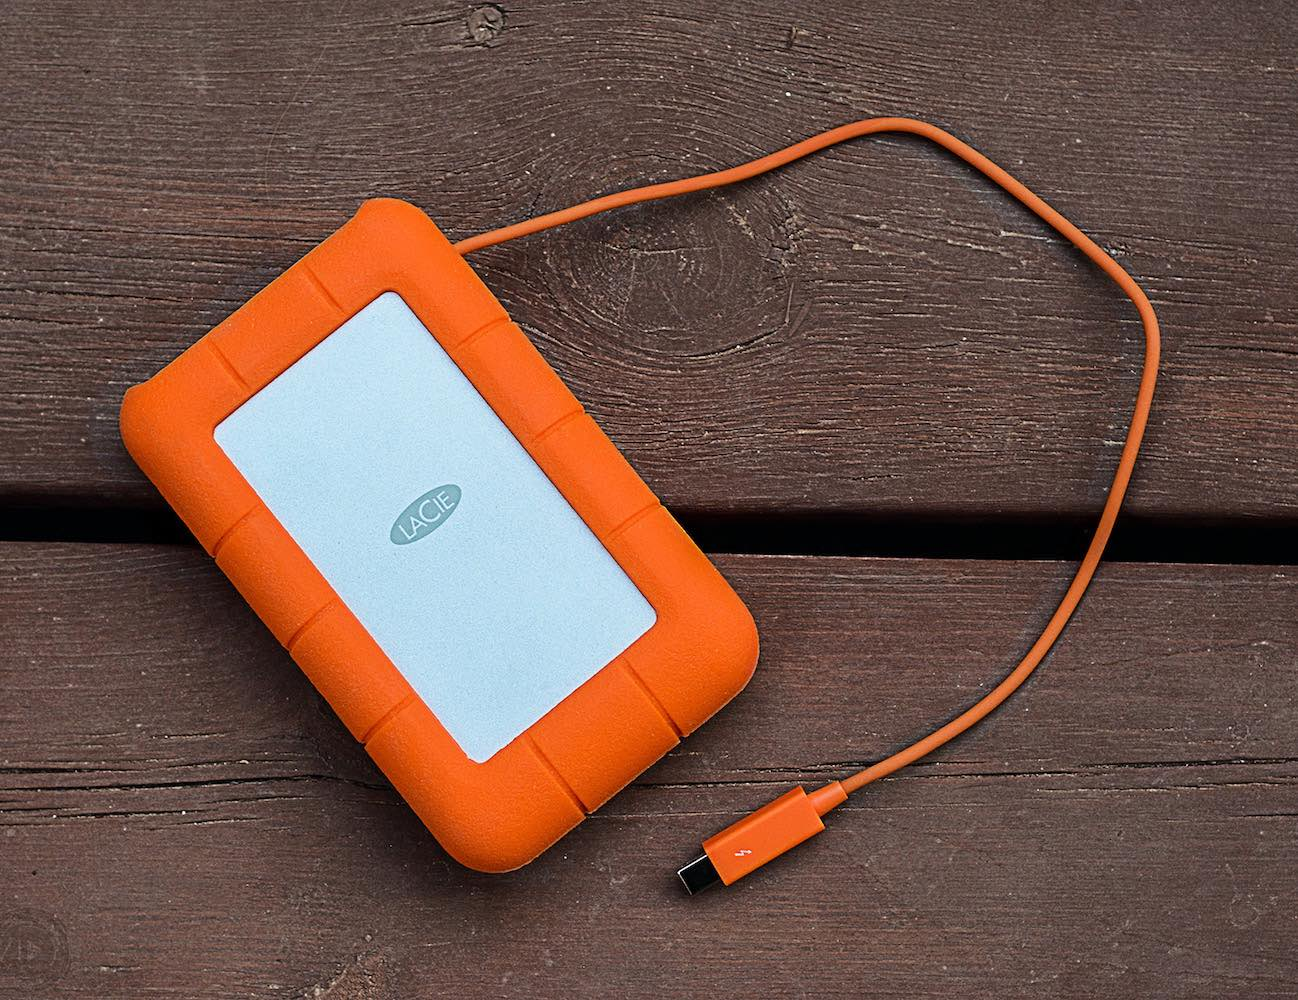 ... RAID Thunderbolt and USB Hard Drive by LaCie ...